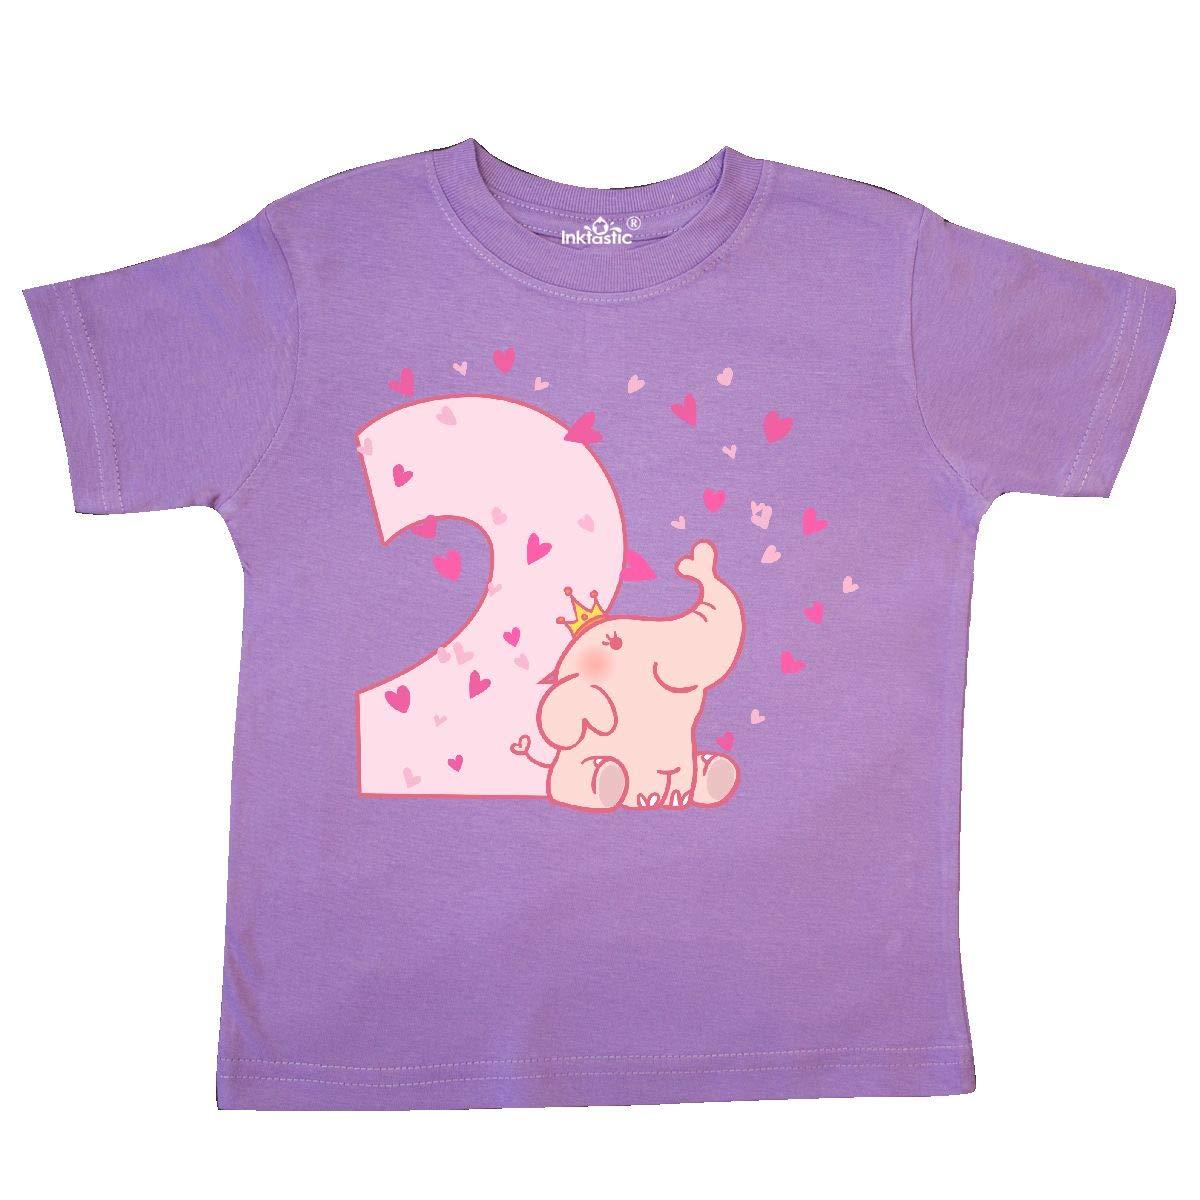 inktastic Pink Elephant 2nd Birthday Toddler T-Shirt